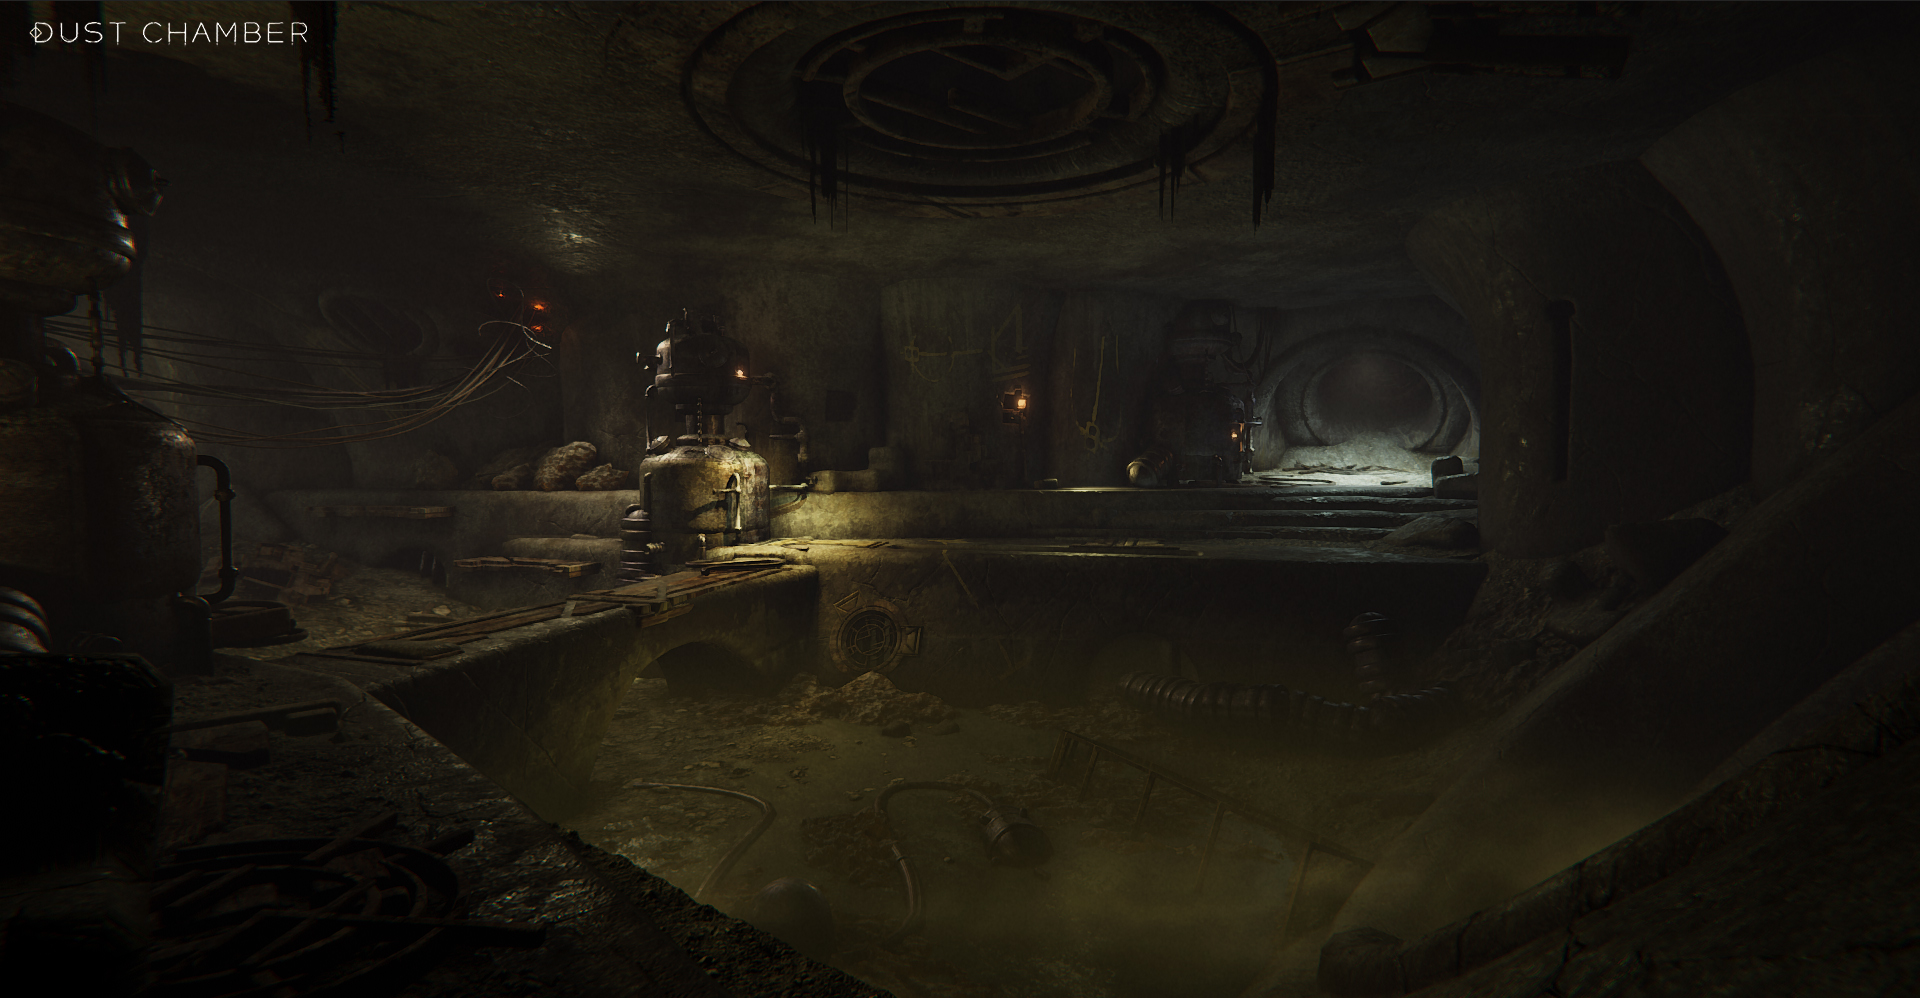 Dust_chamber_collectors_sewers_01 | Скриншотный субботник. 2021, Июль, 5 неделя.